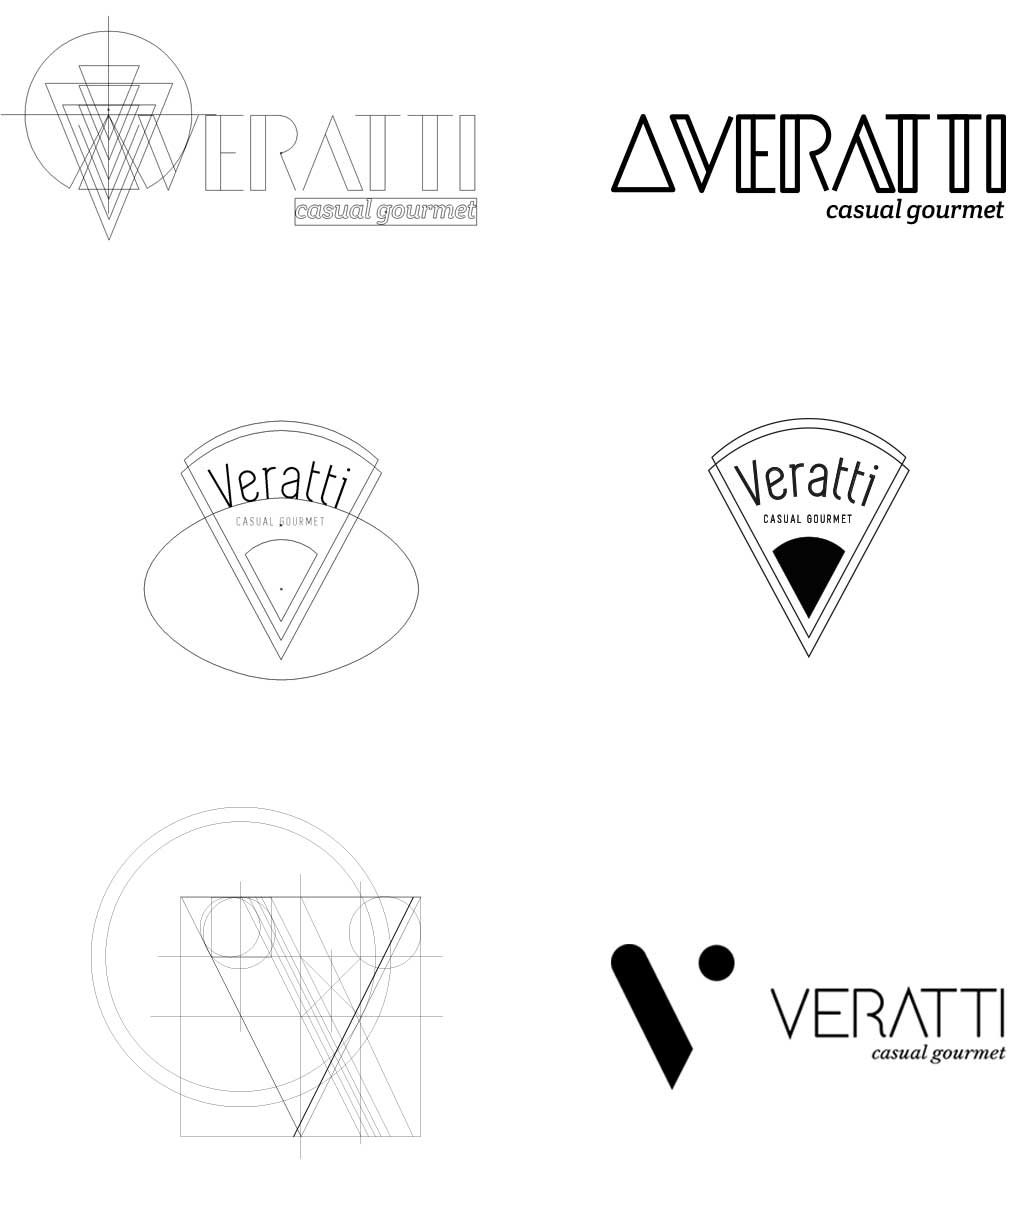 KFDS - Veratti Case Study Visual Loghi